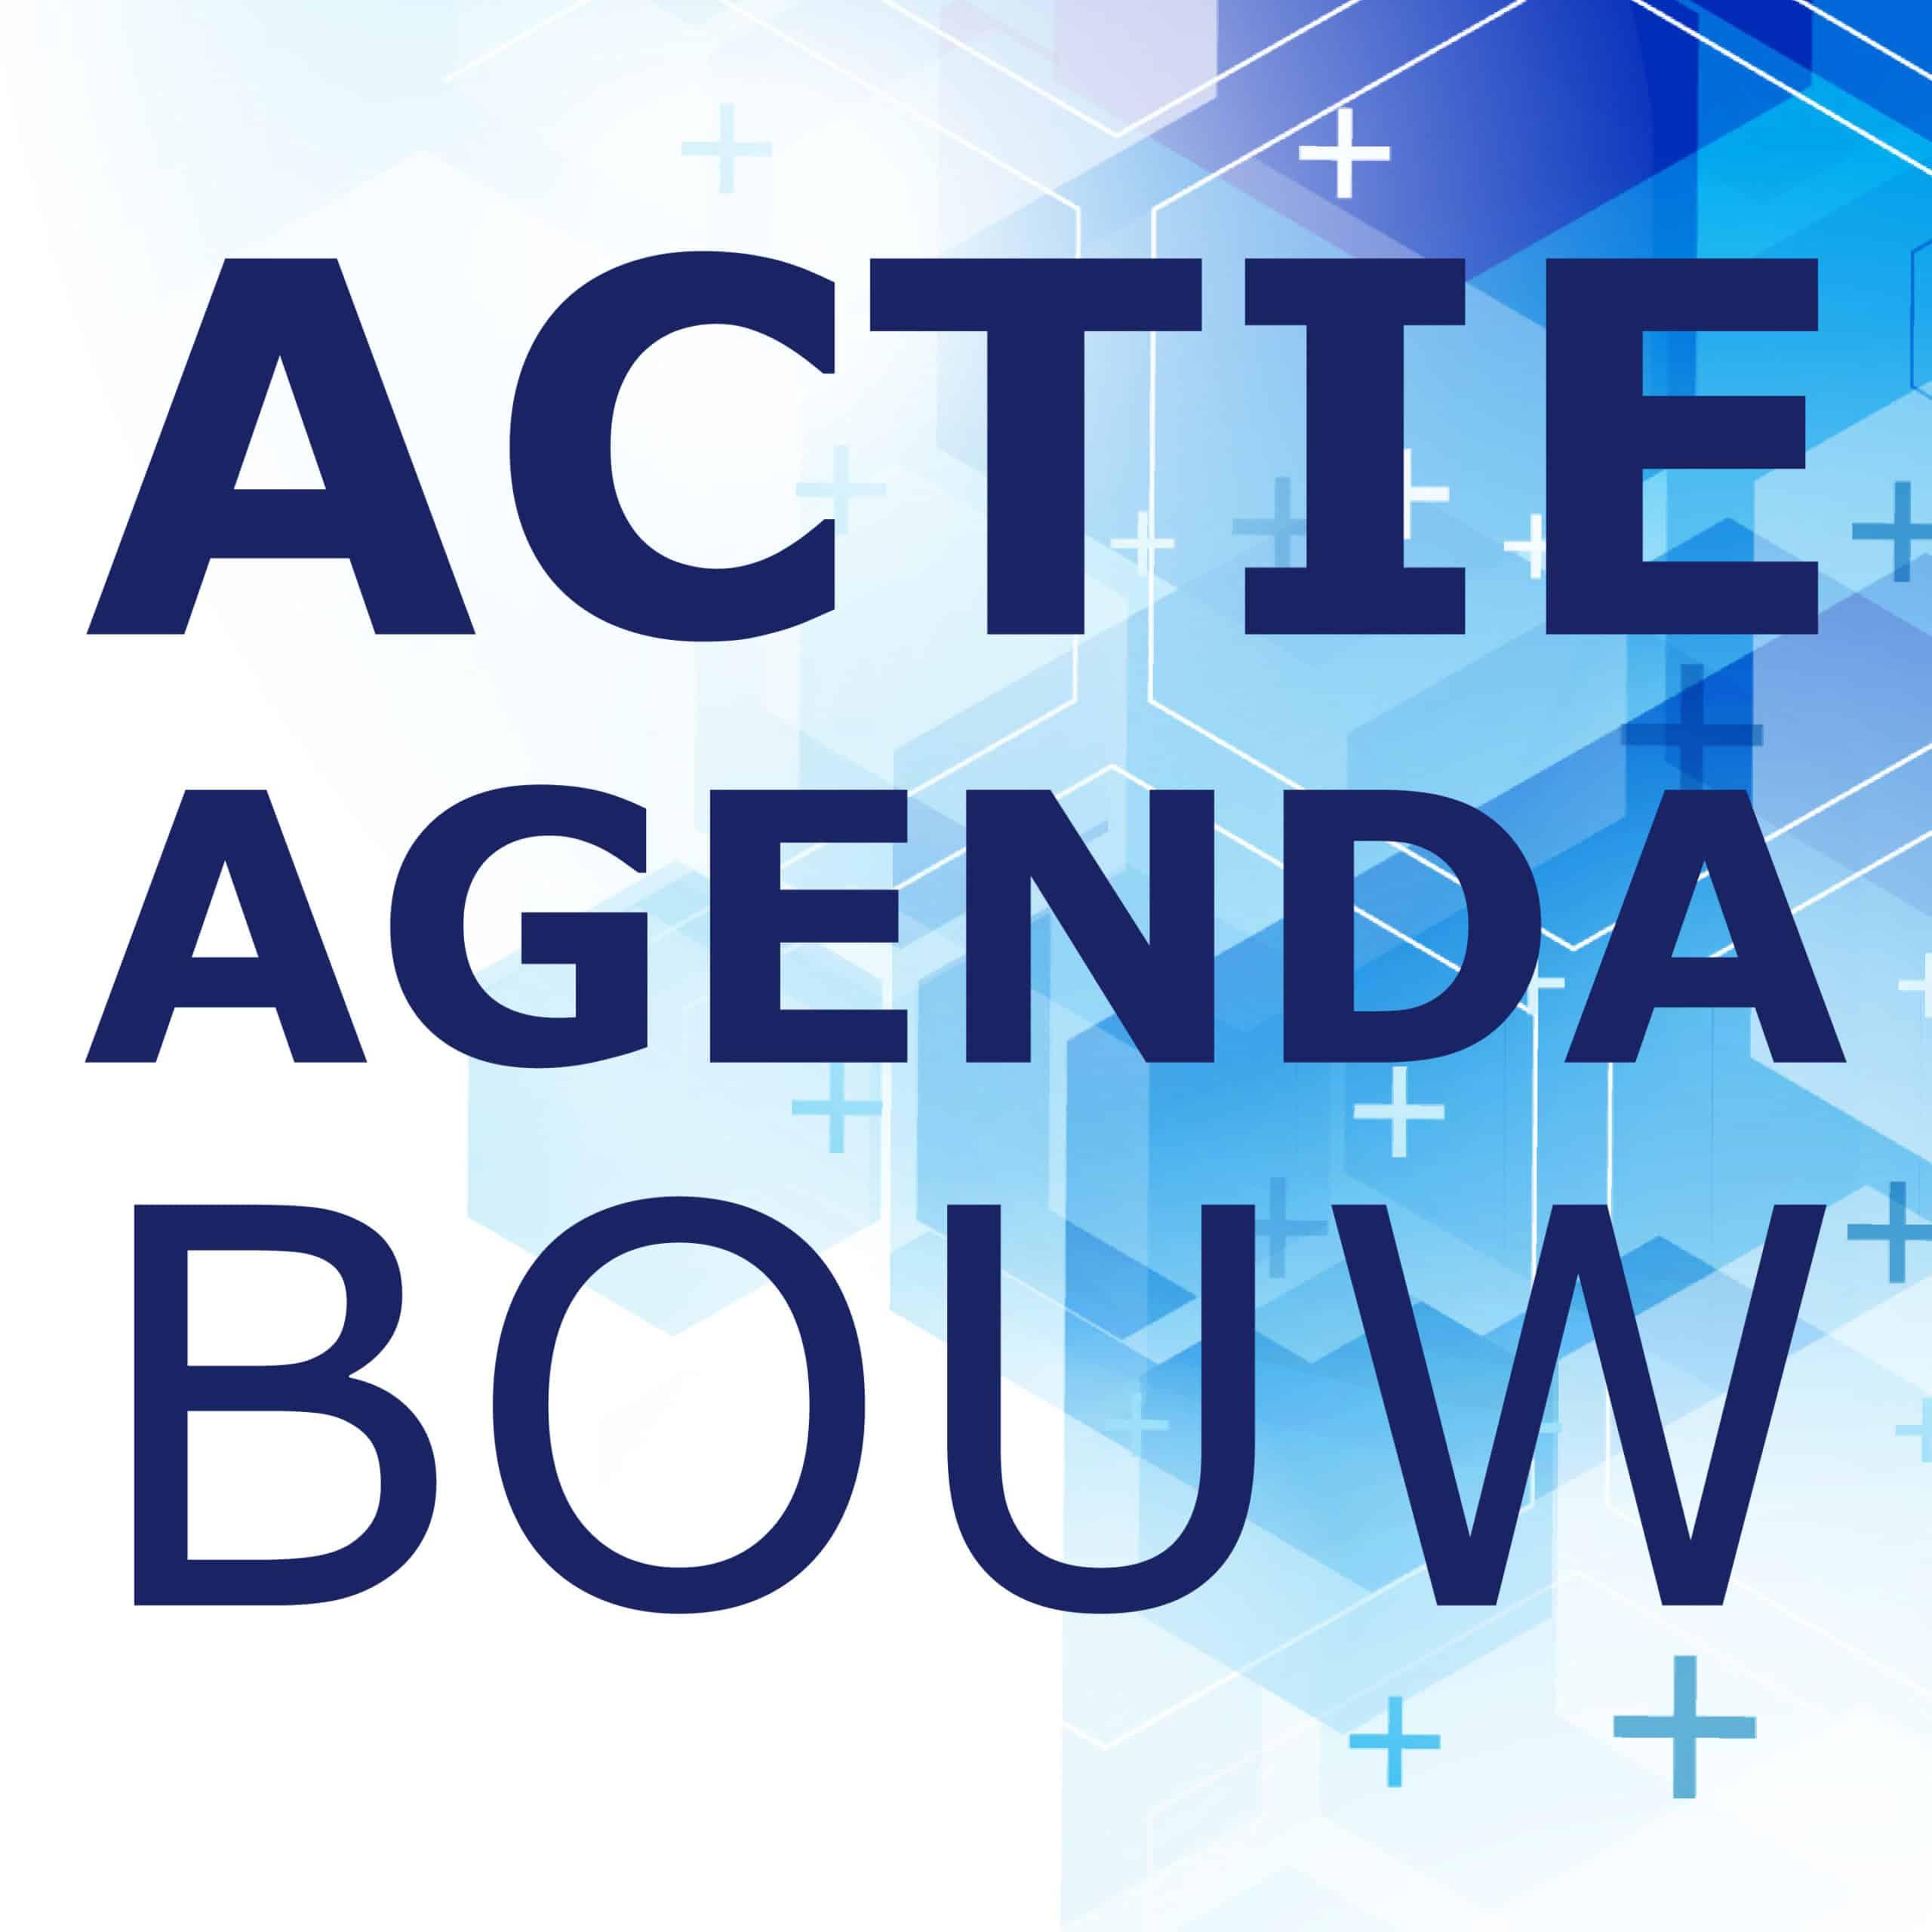 Actieagenda-Bouw-logo-5-scaled